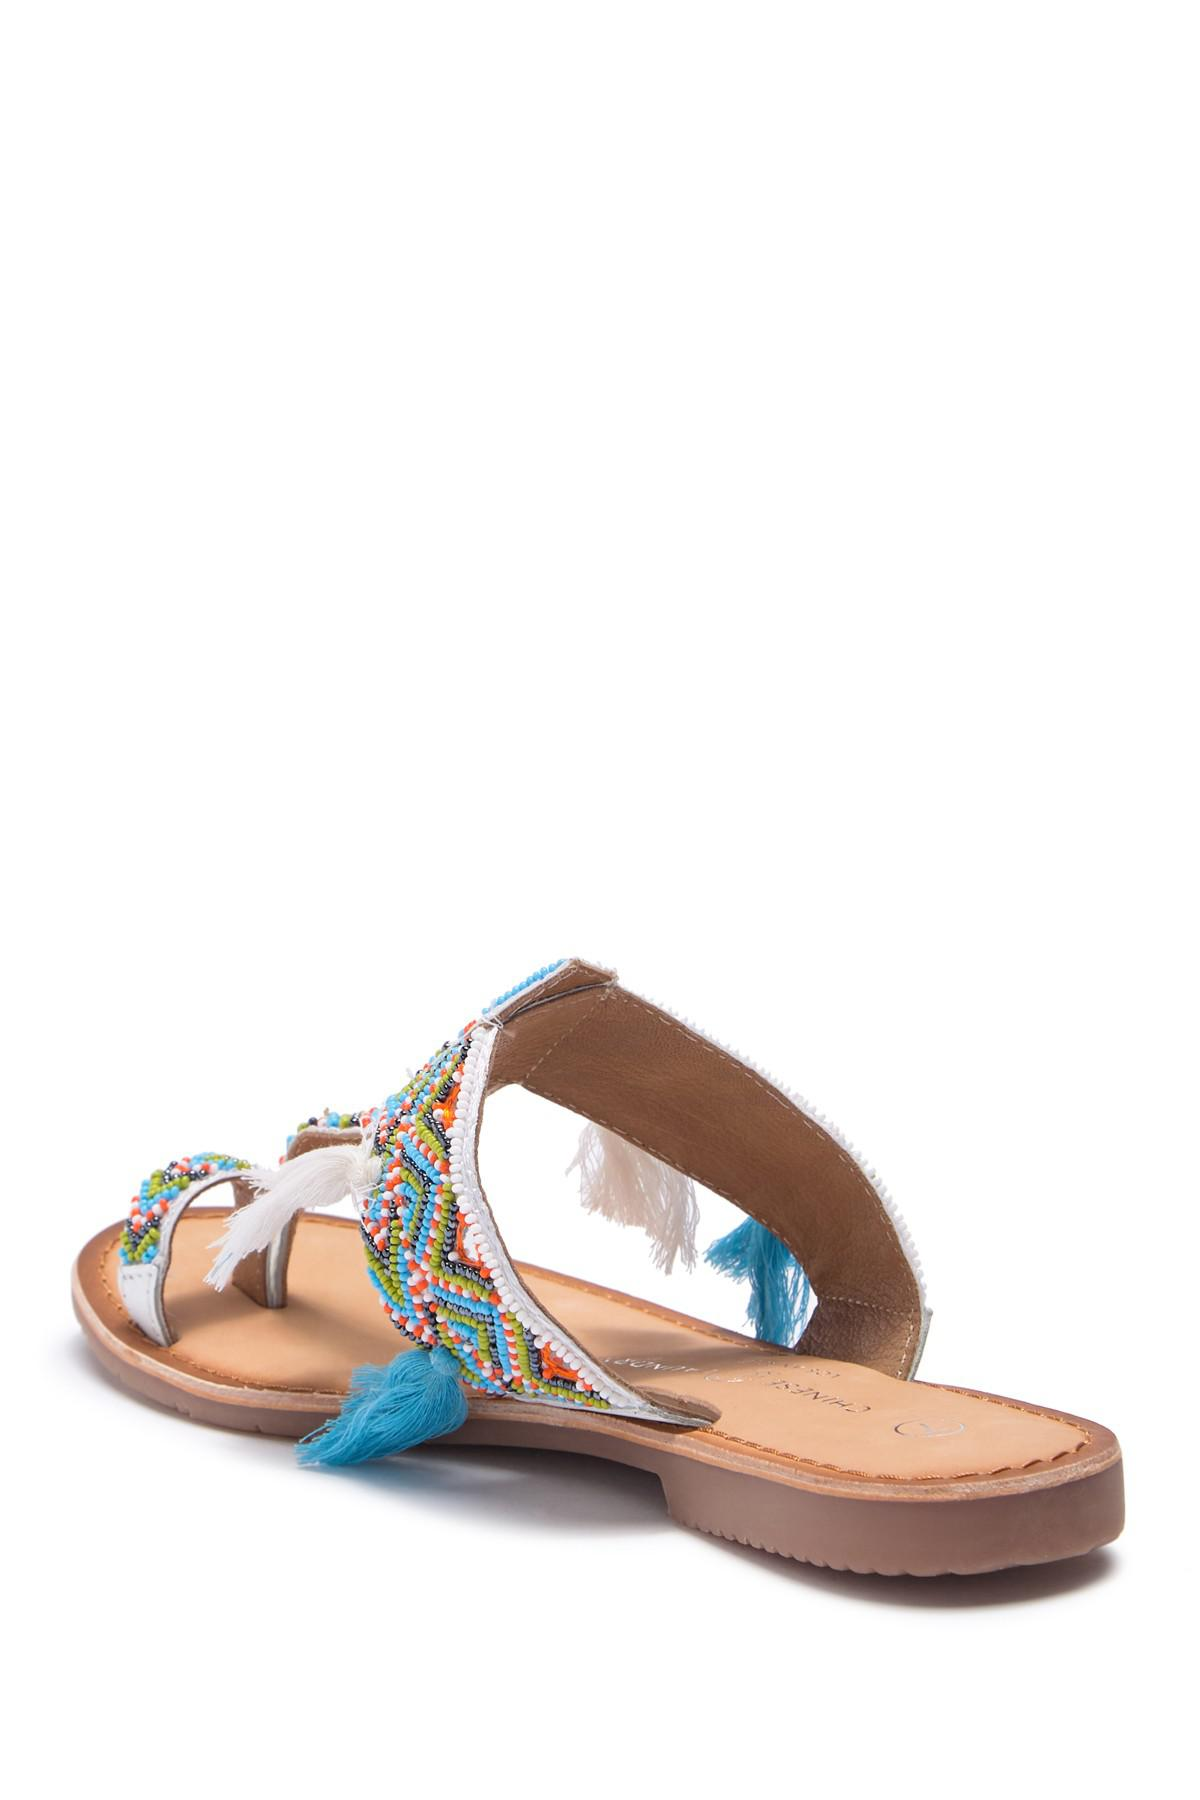 ab85ef77db49 Lyst - Chinese Laundry Paradiso Embellished Sandal in White